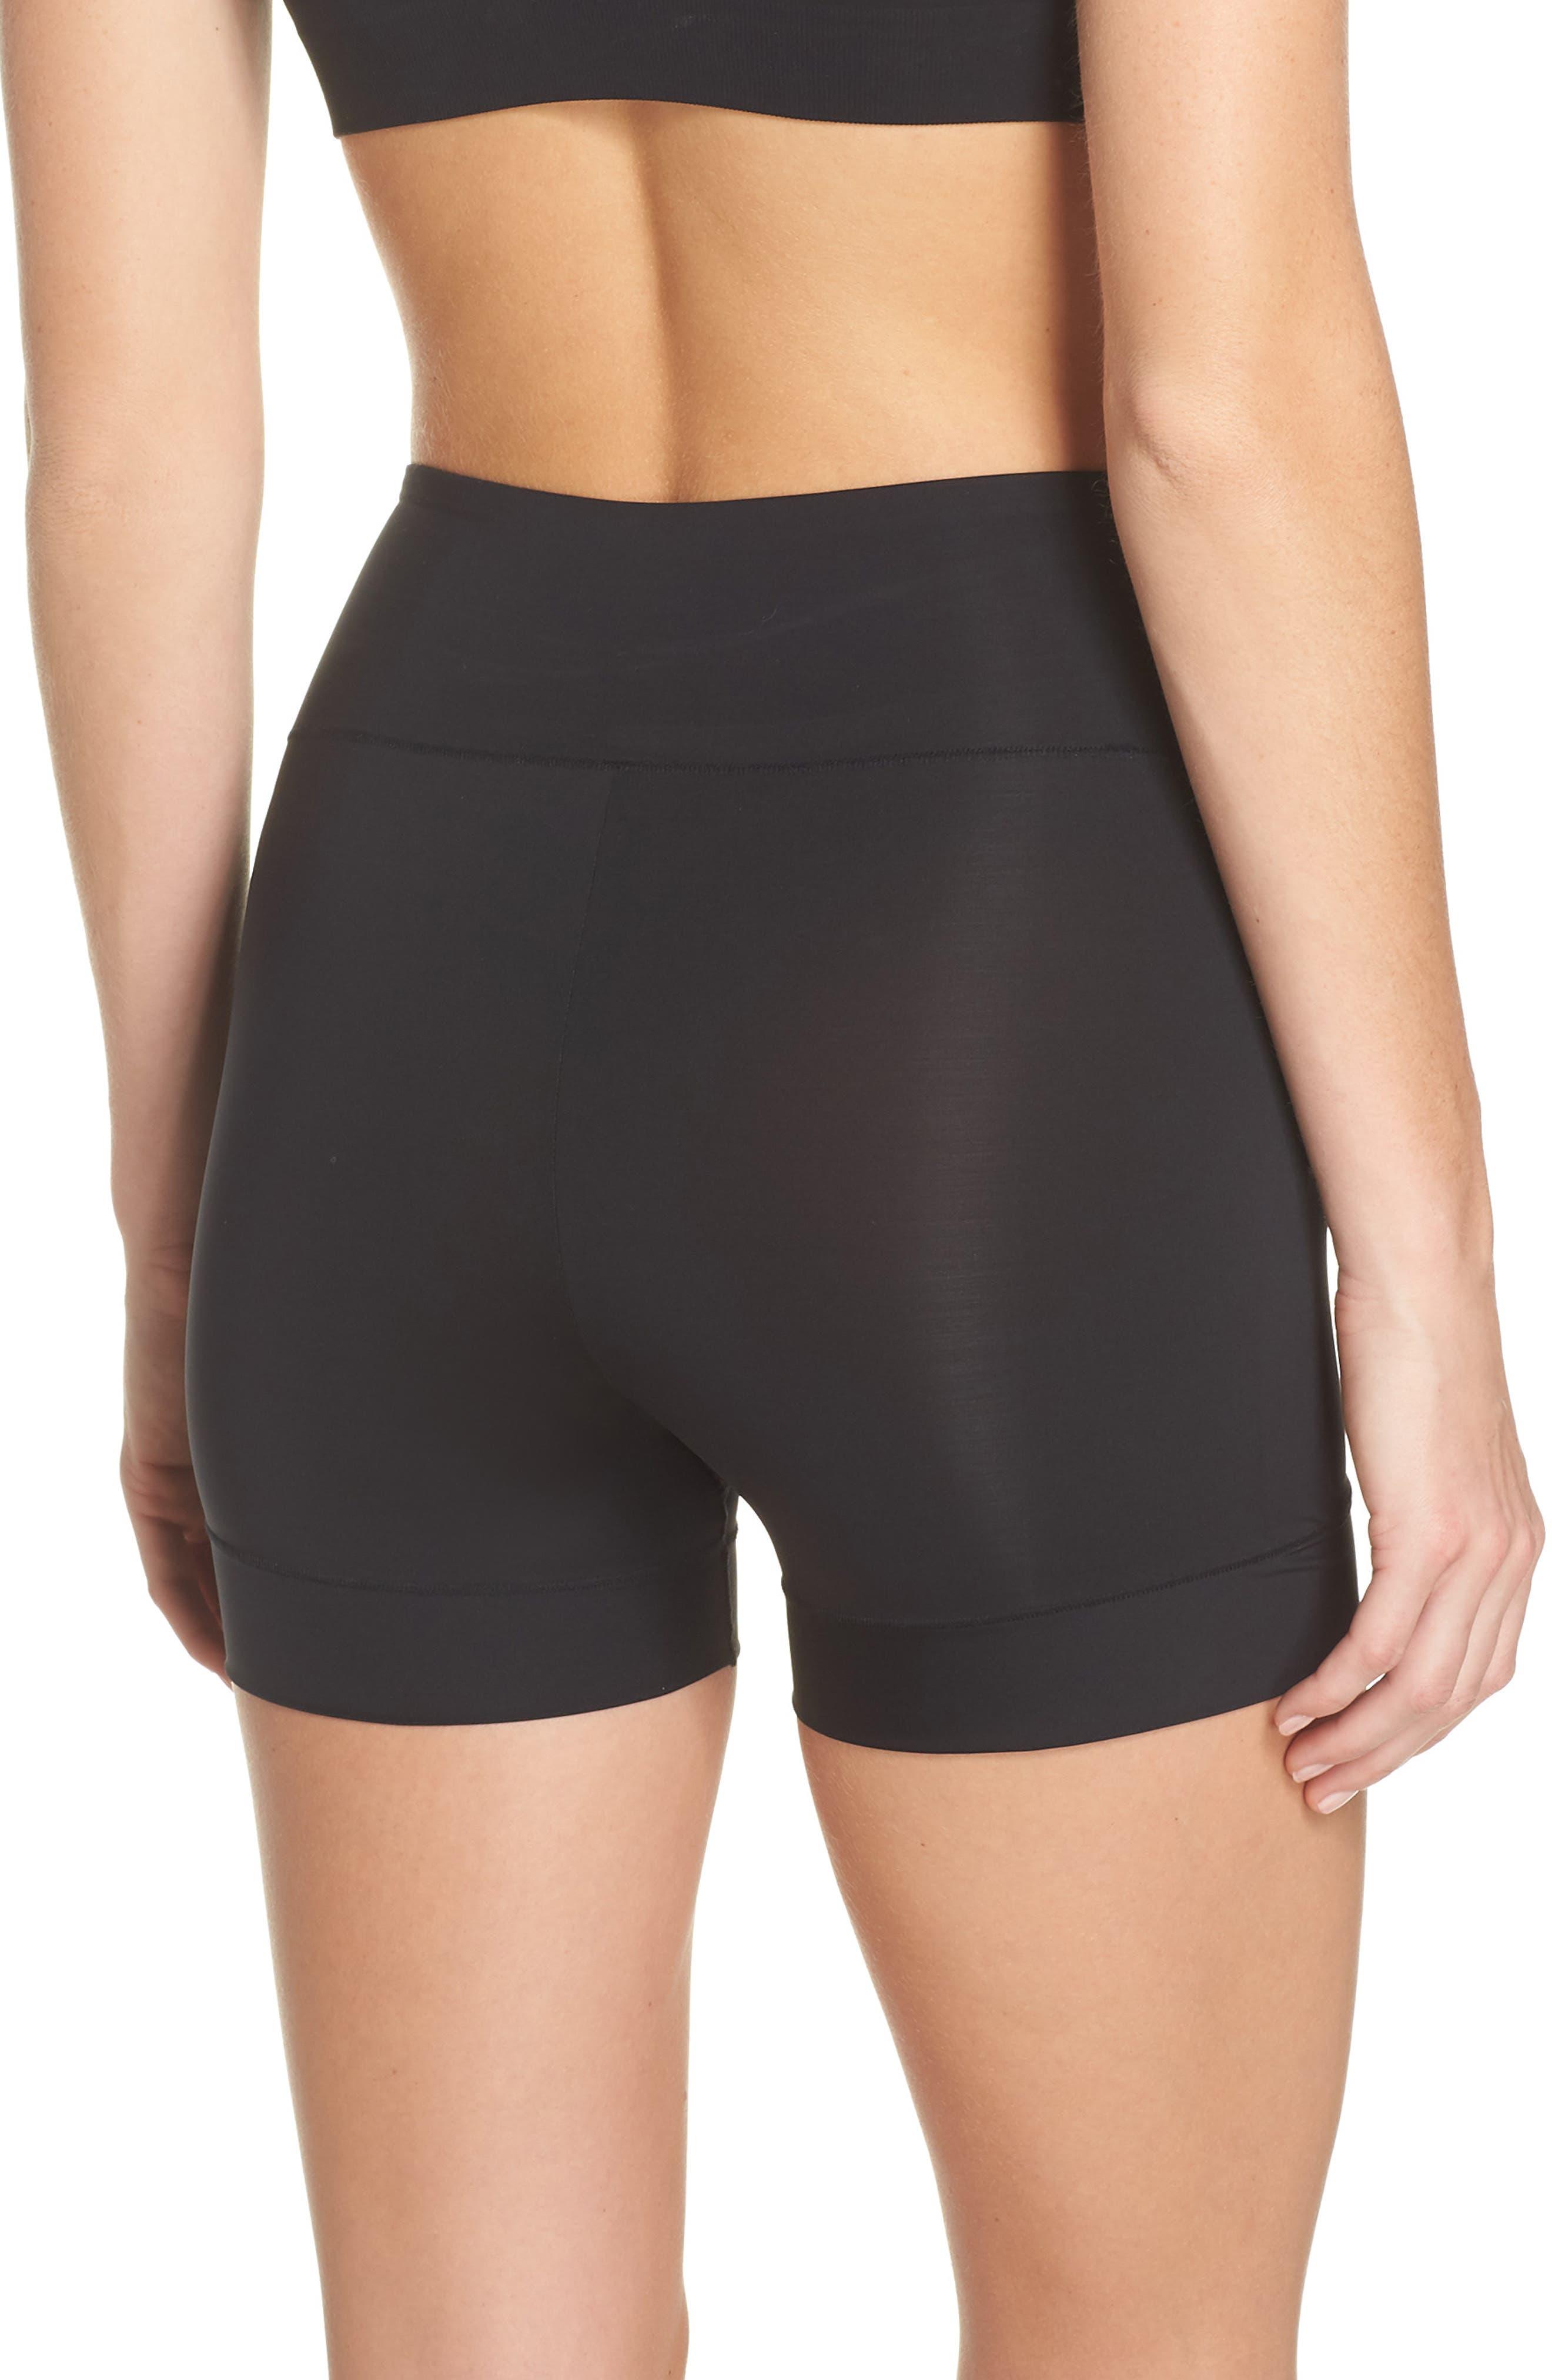 Tummie Tamers Mid Waist Shaping Shorts,                             Alternate thumbnail 2, color,                             001